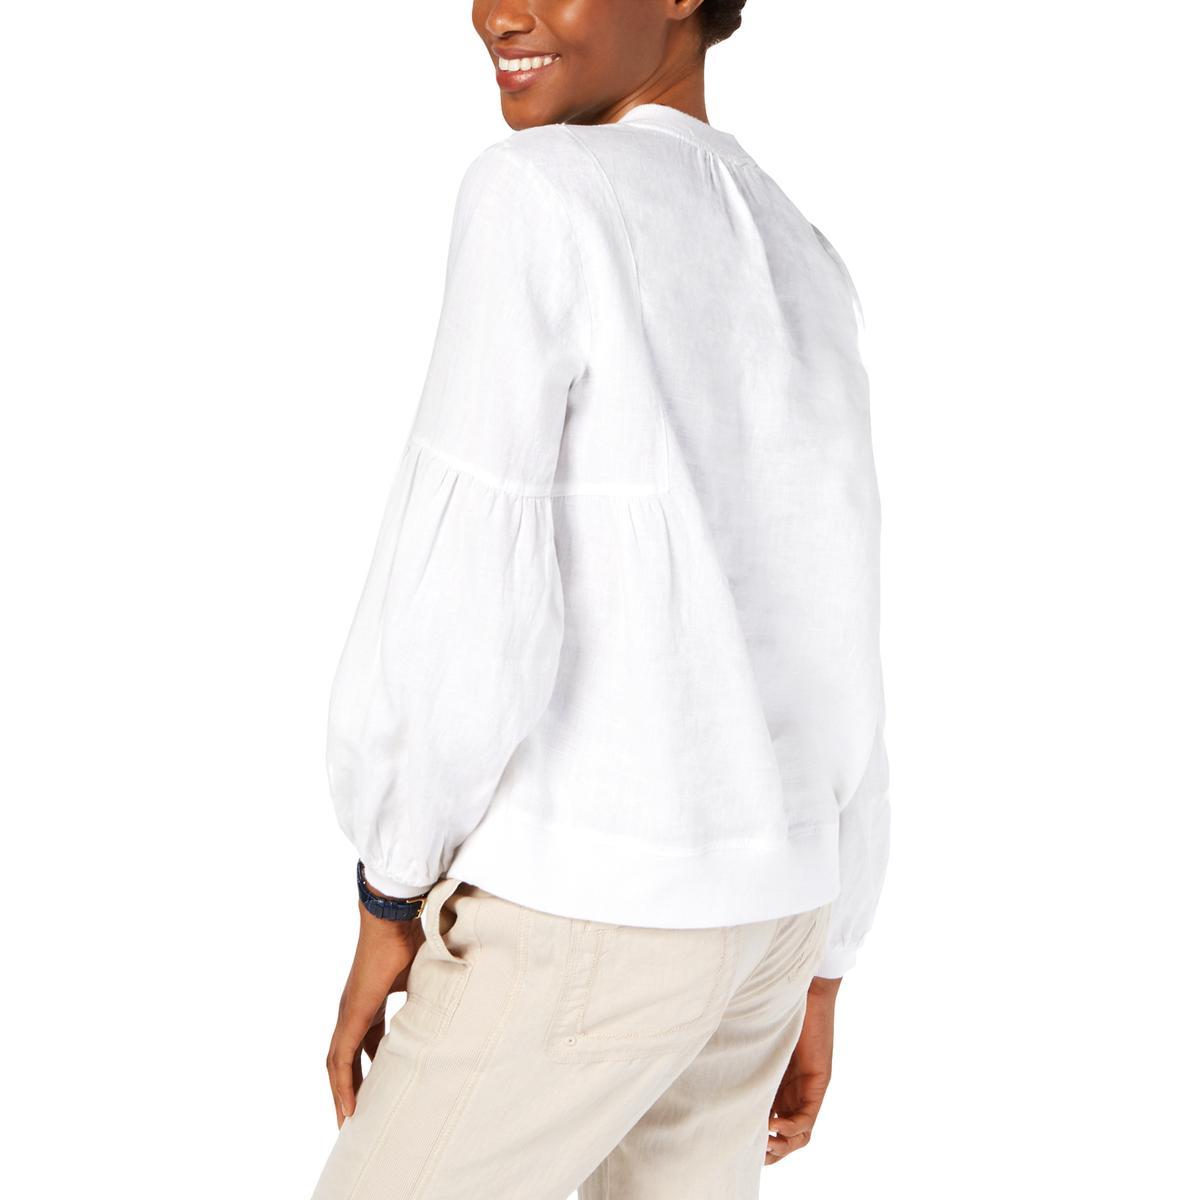 Tommy-Hilfiger-Womens-White-Linen-Split-Neck-Peasant-Top-Shirt-XS-BHFO-2022 thumbnail 4